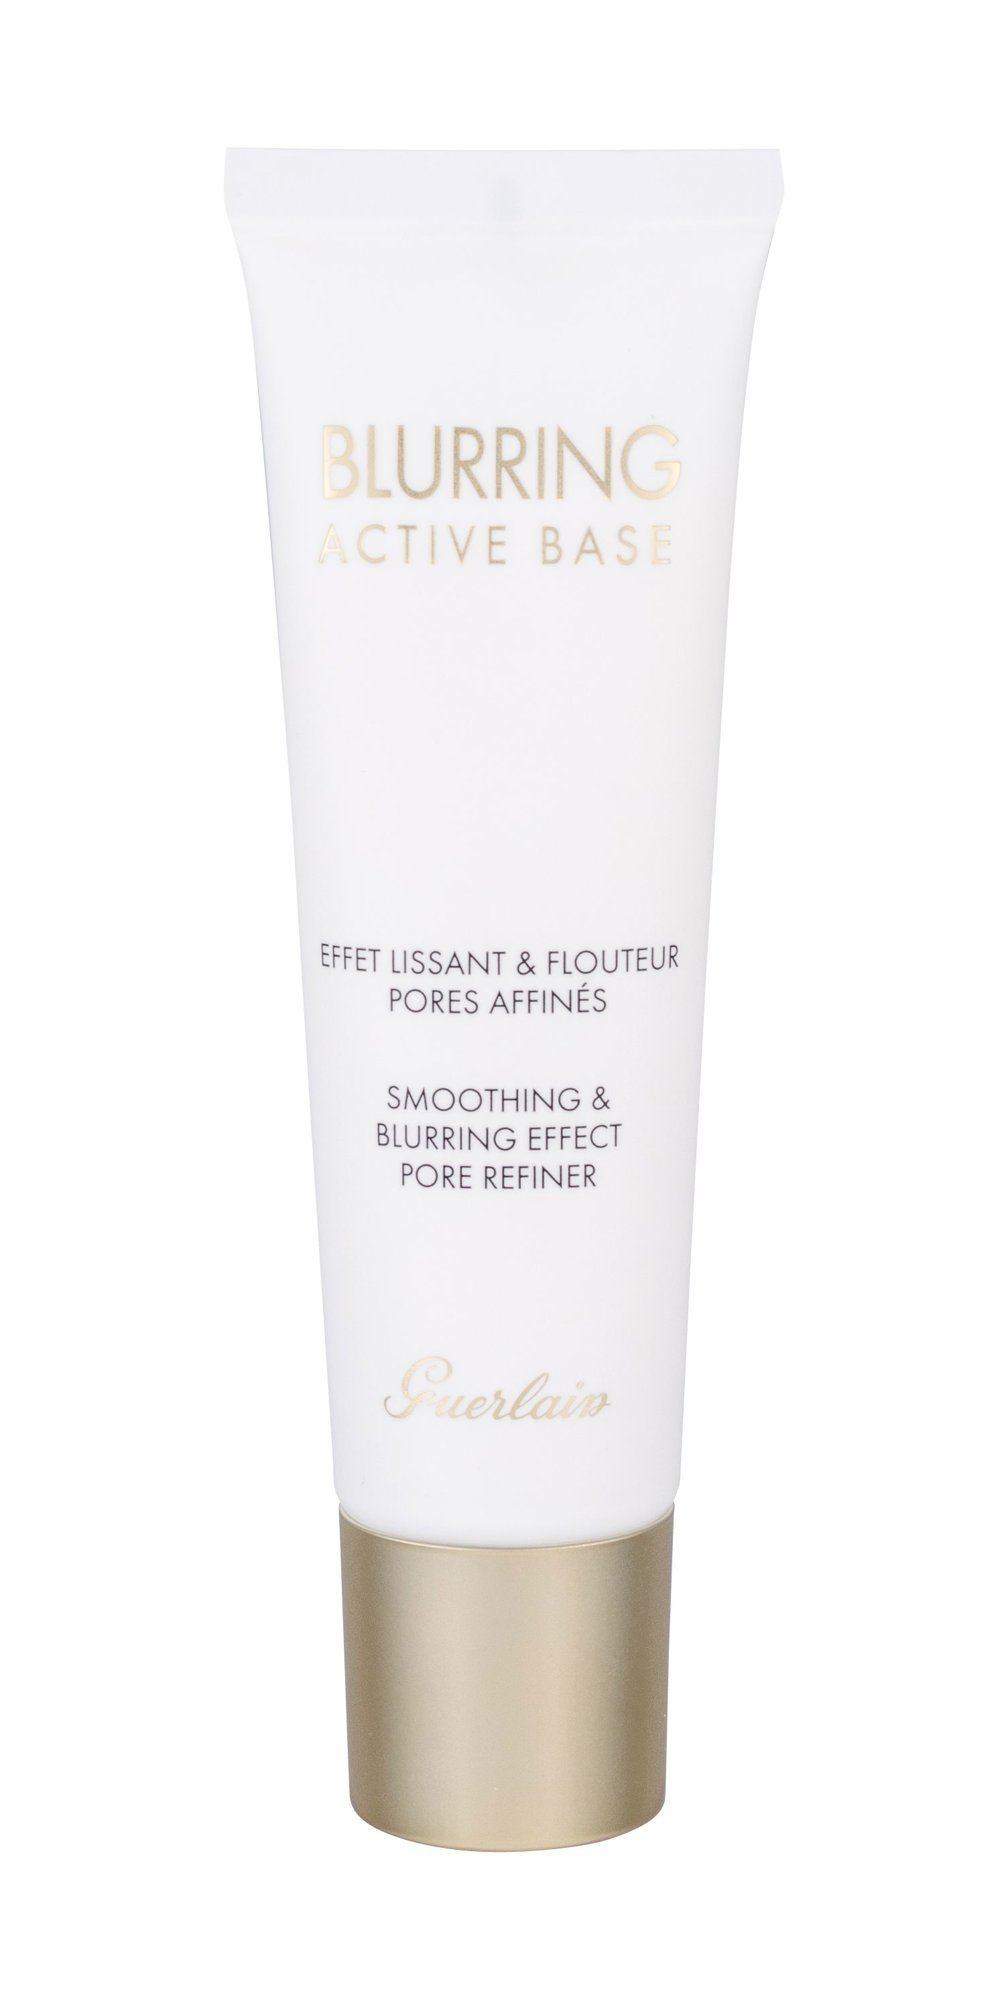 Guerlain Blurring Active Base Cosmetic 30ml